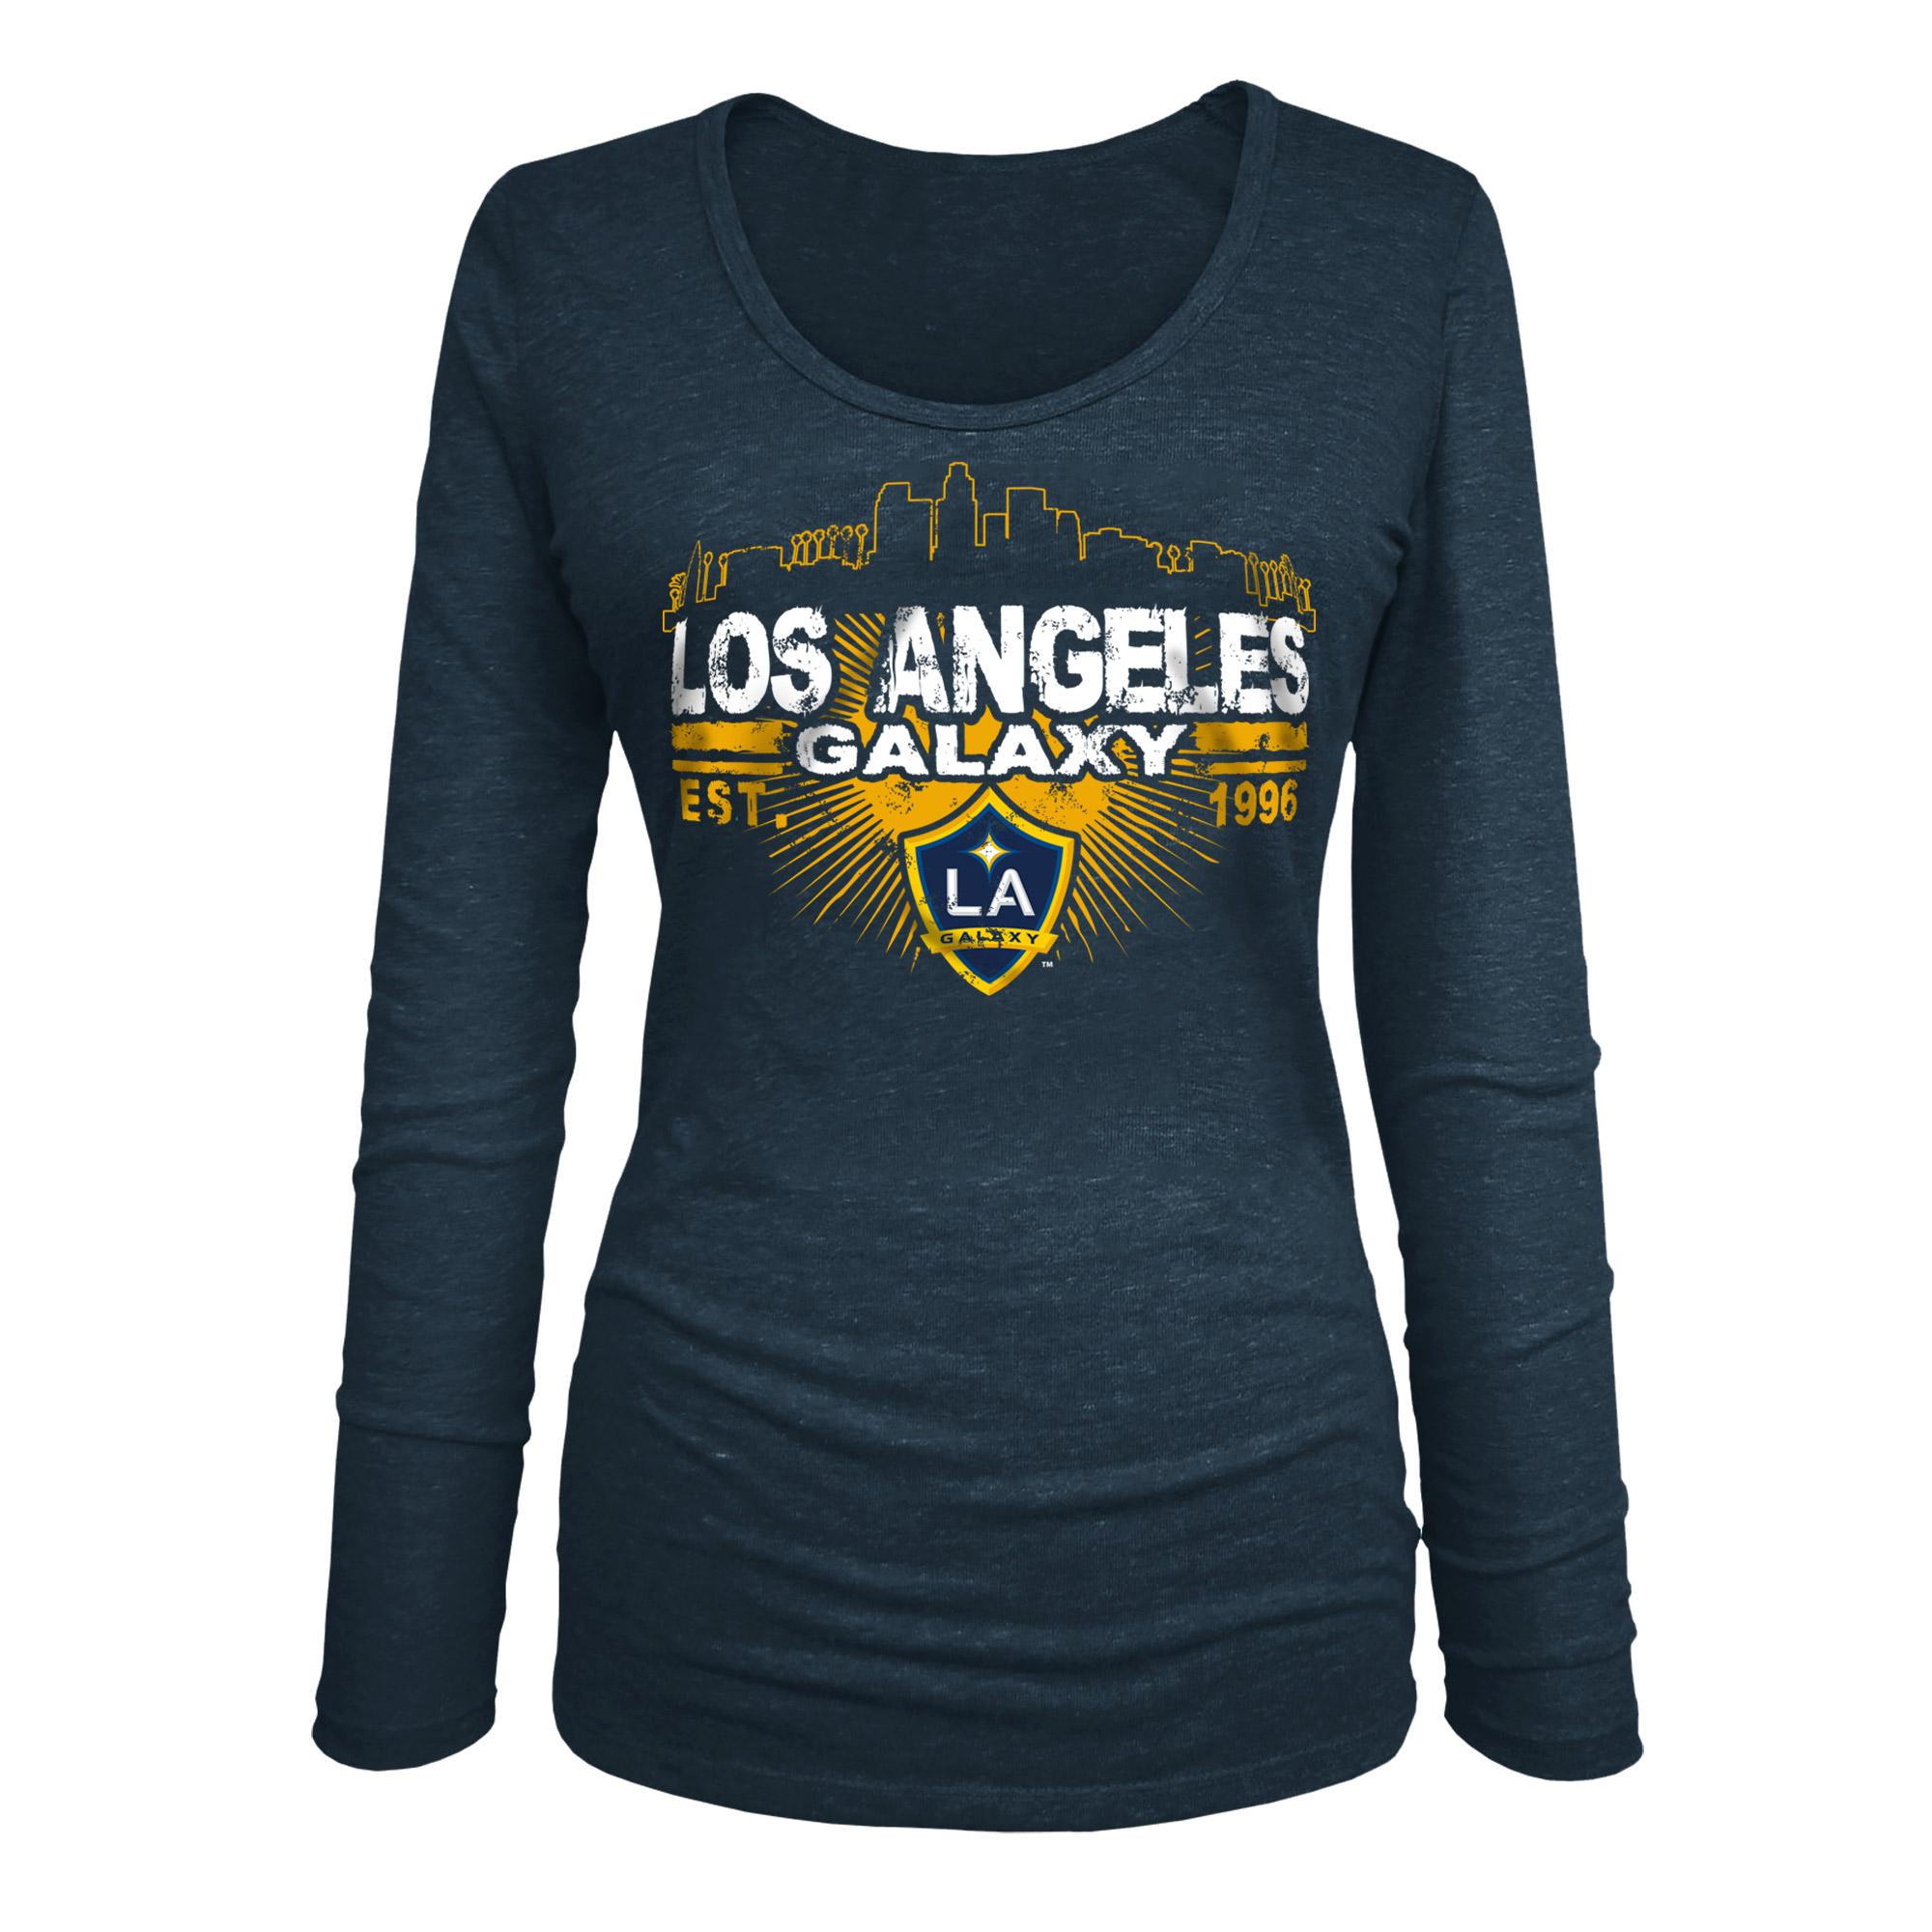 LA Galaxy 5th & Ocean by New Era Women's Tri-Blend U-Neck Long Sleeve T-Shirt - Heather Navy